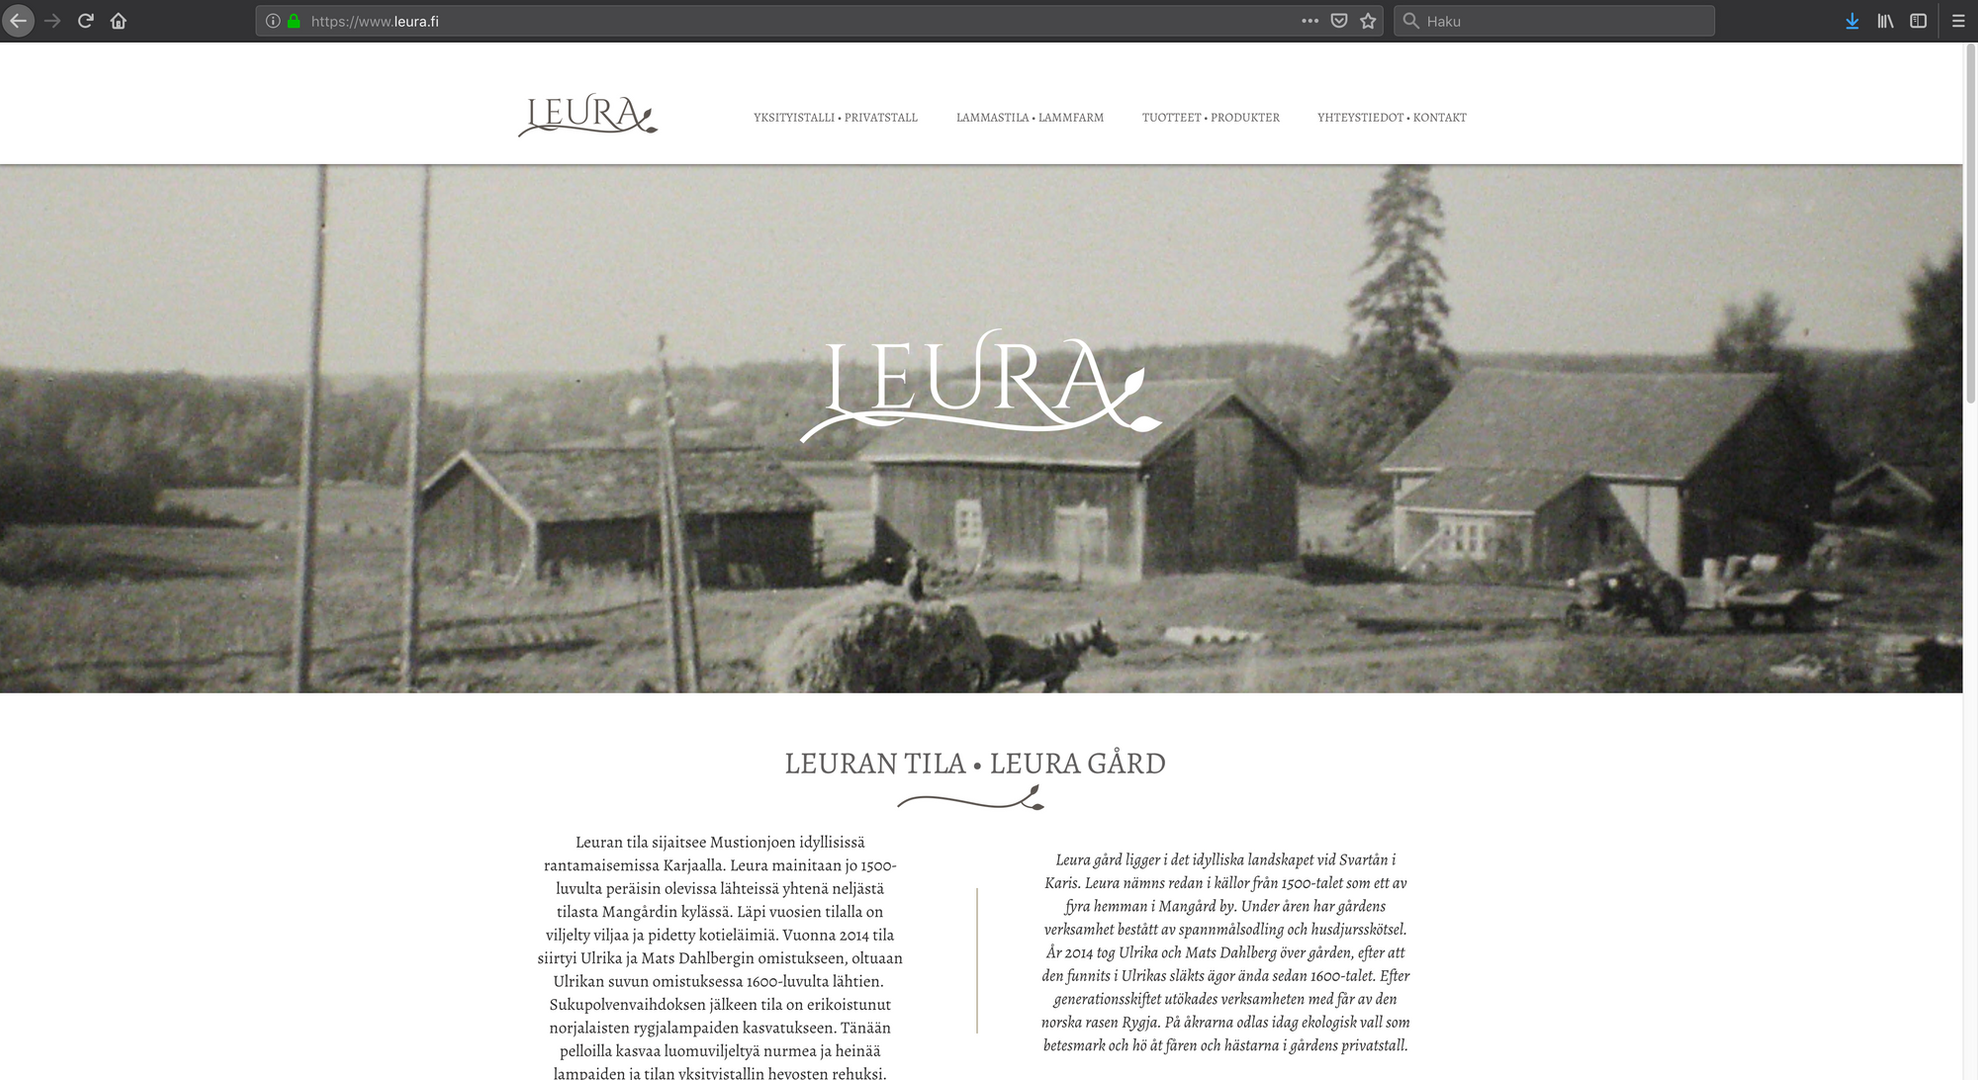 leura.fi